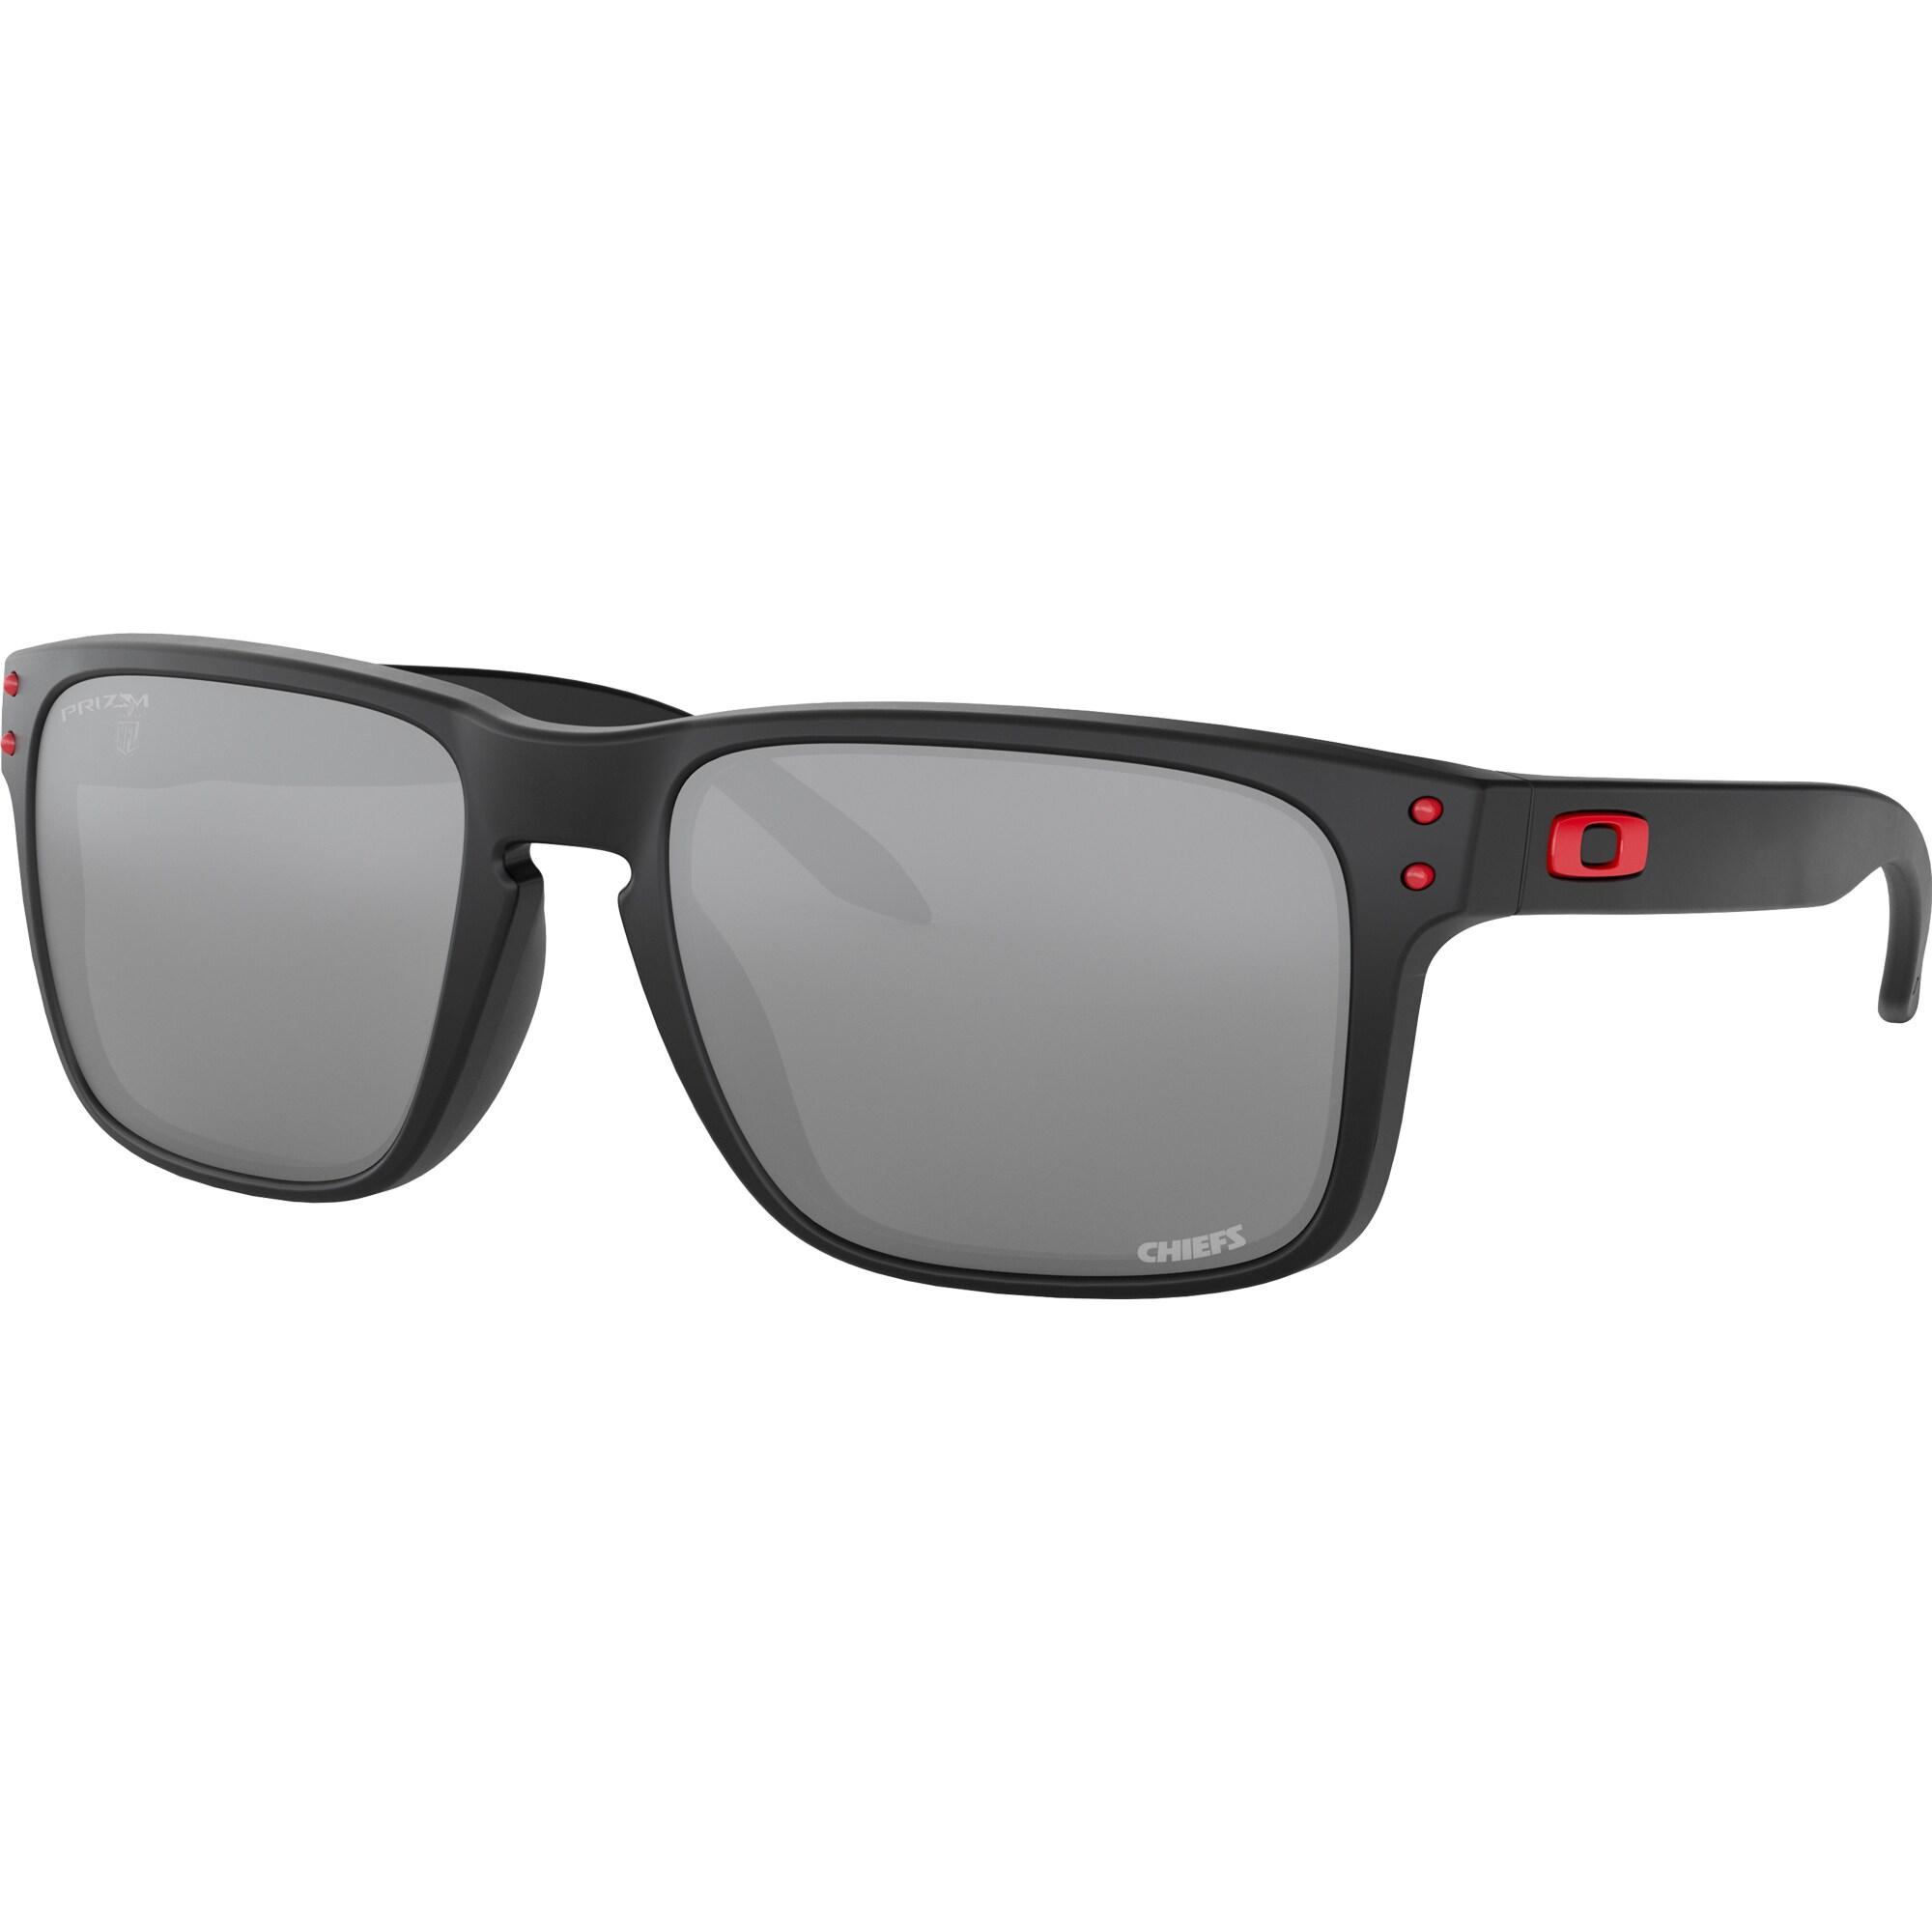 Kansas City Chiefs Oakley Holbrook Sunglasses